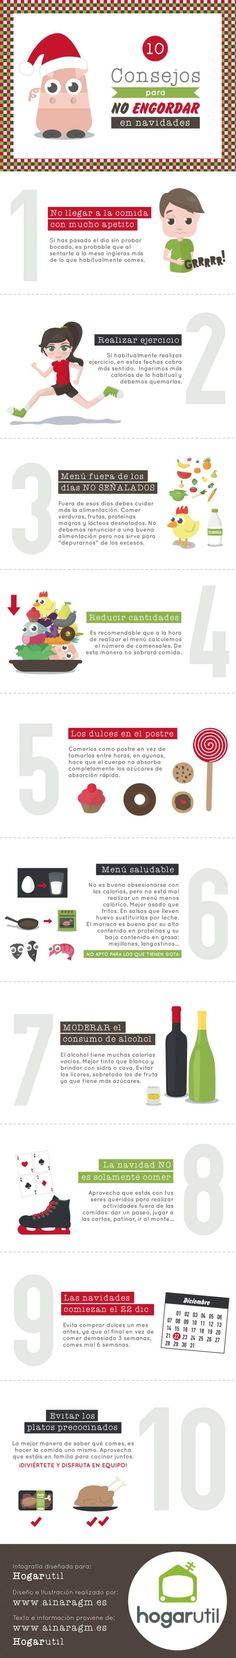 #Infografia 10 consejos para no engordar en navidades by @ainaragm